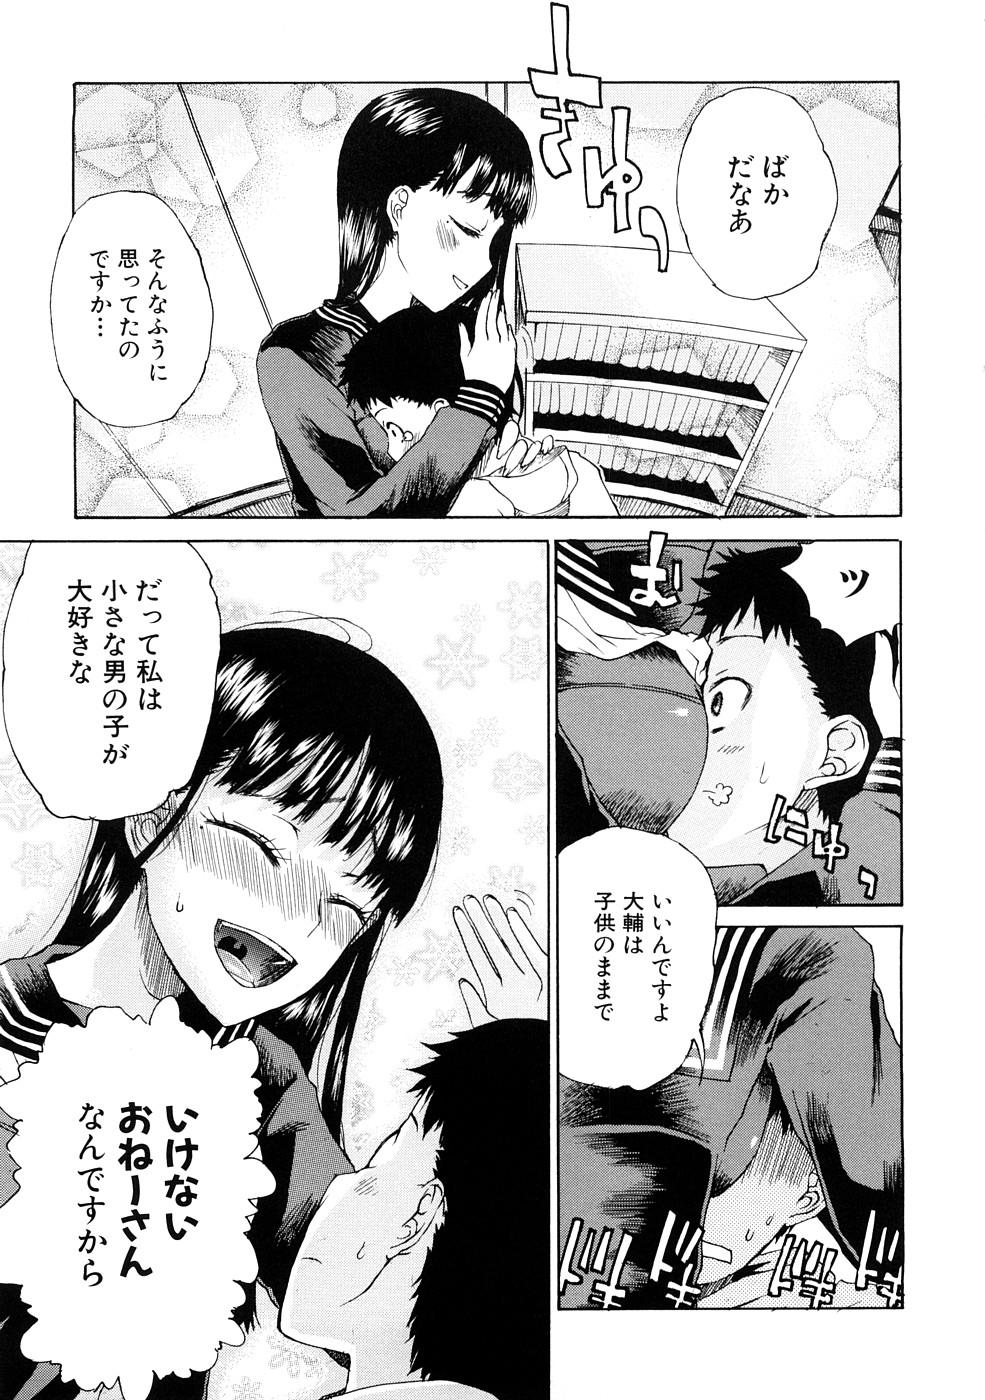 Ecchi de Jibunkatte de Kawaii Ko 70